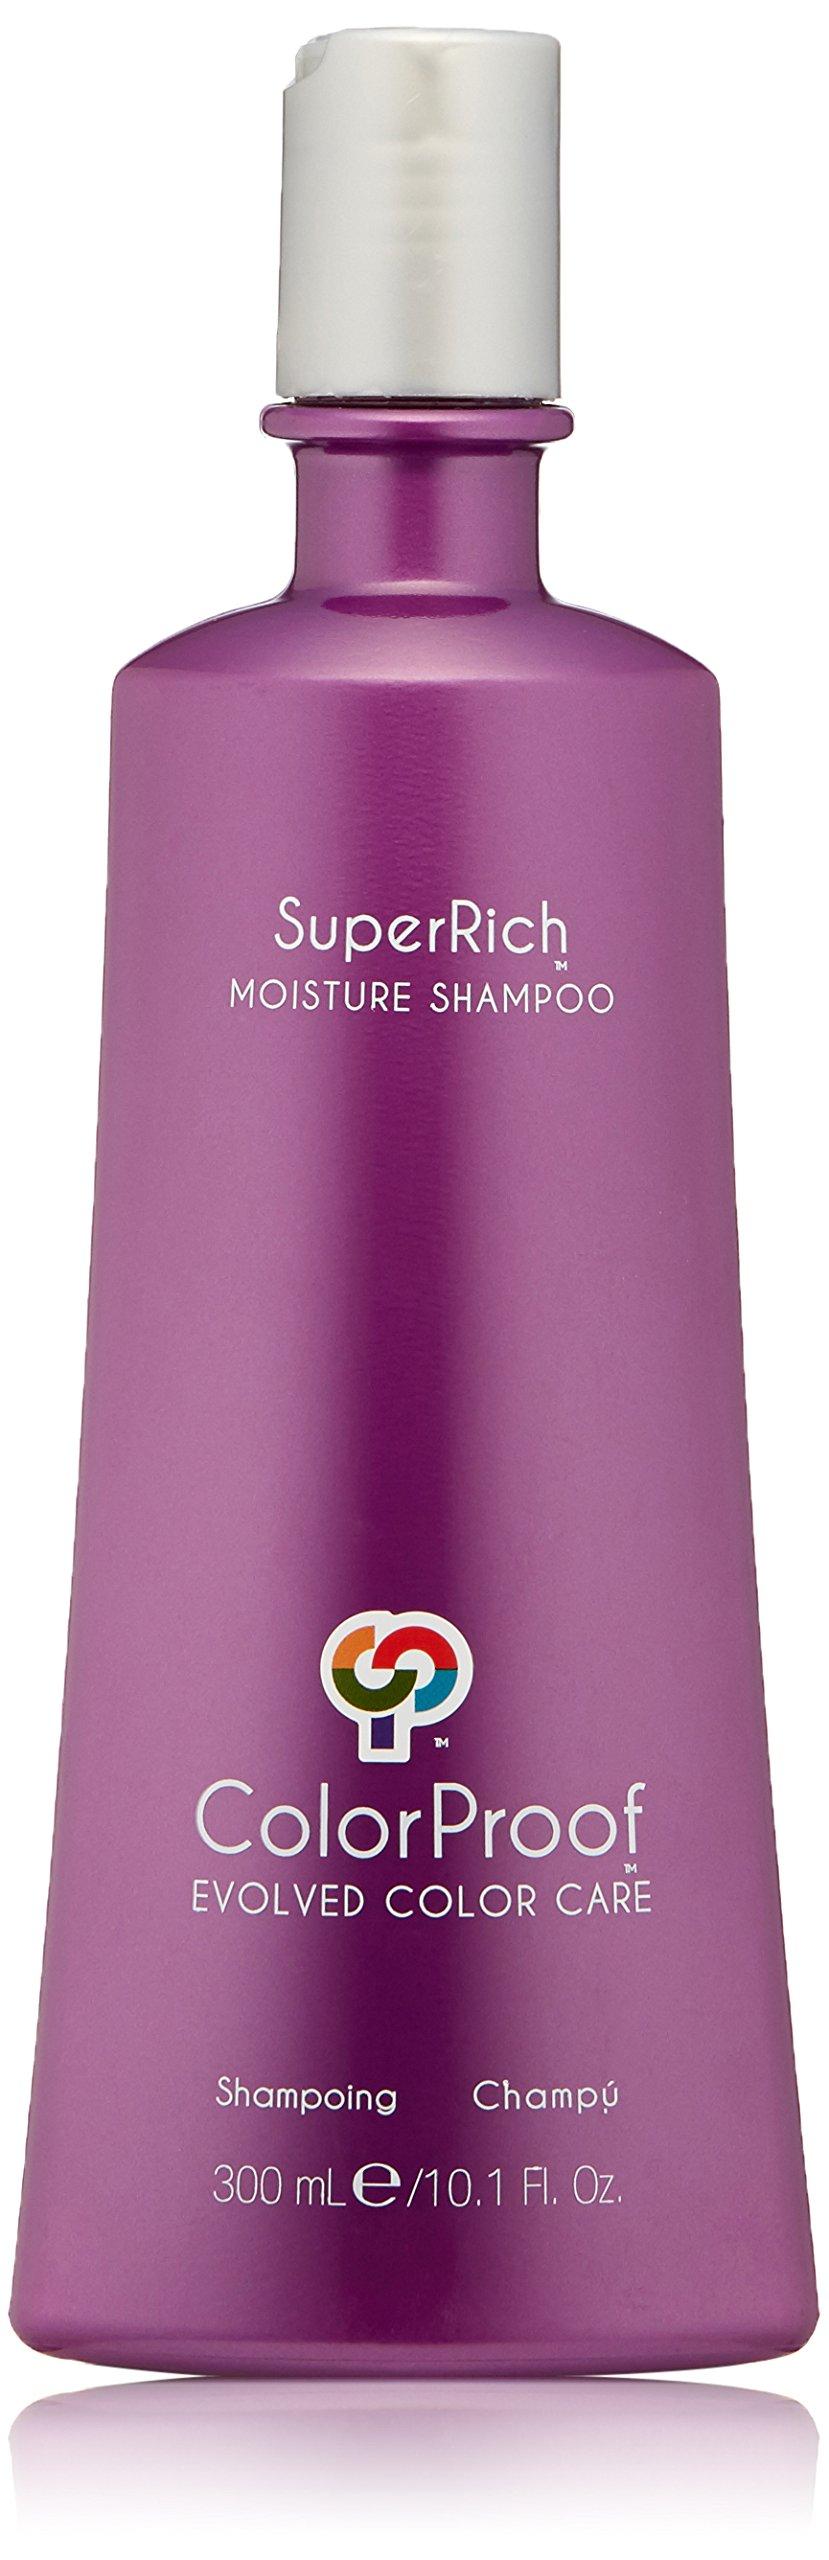 ColorProof SuperRich Moisture Sulfate-Free Shampoo 10.1 Fl. Oz.